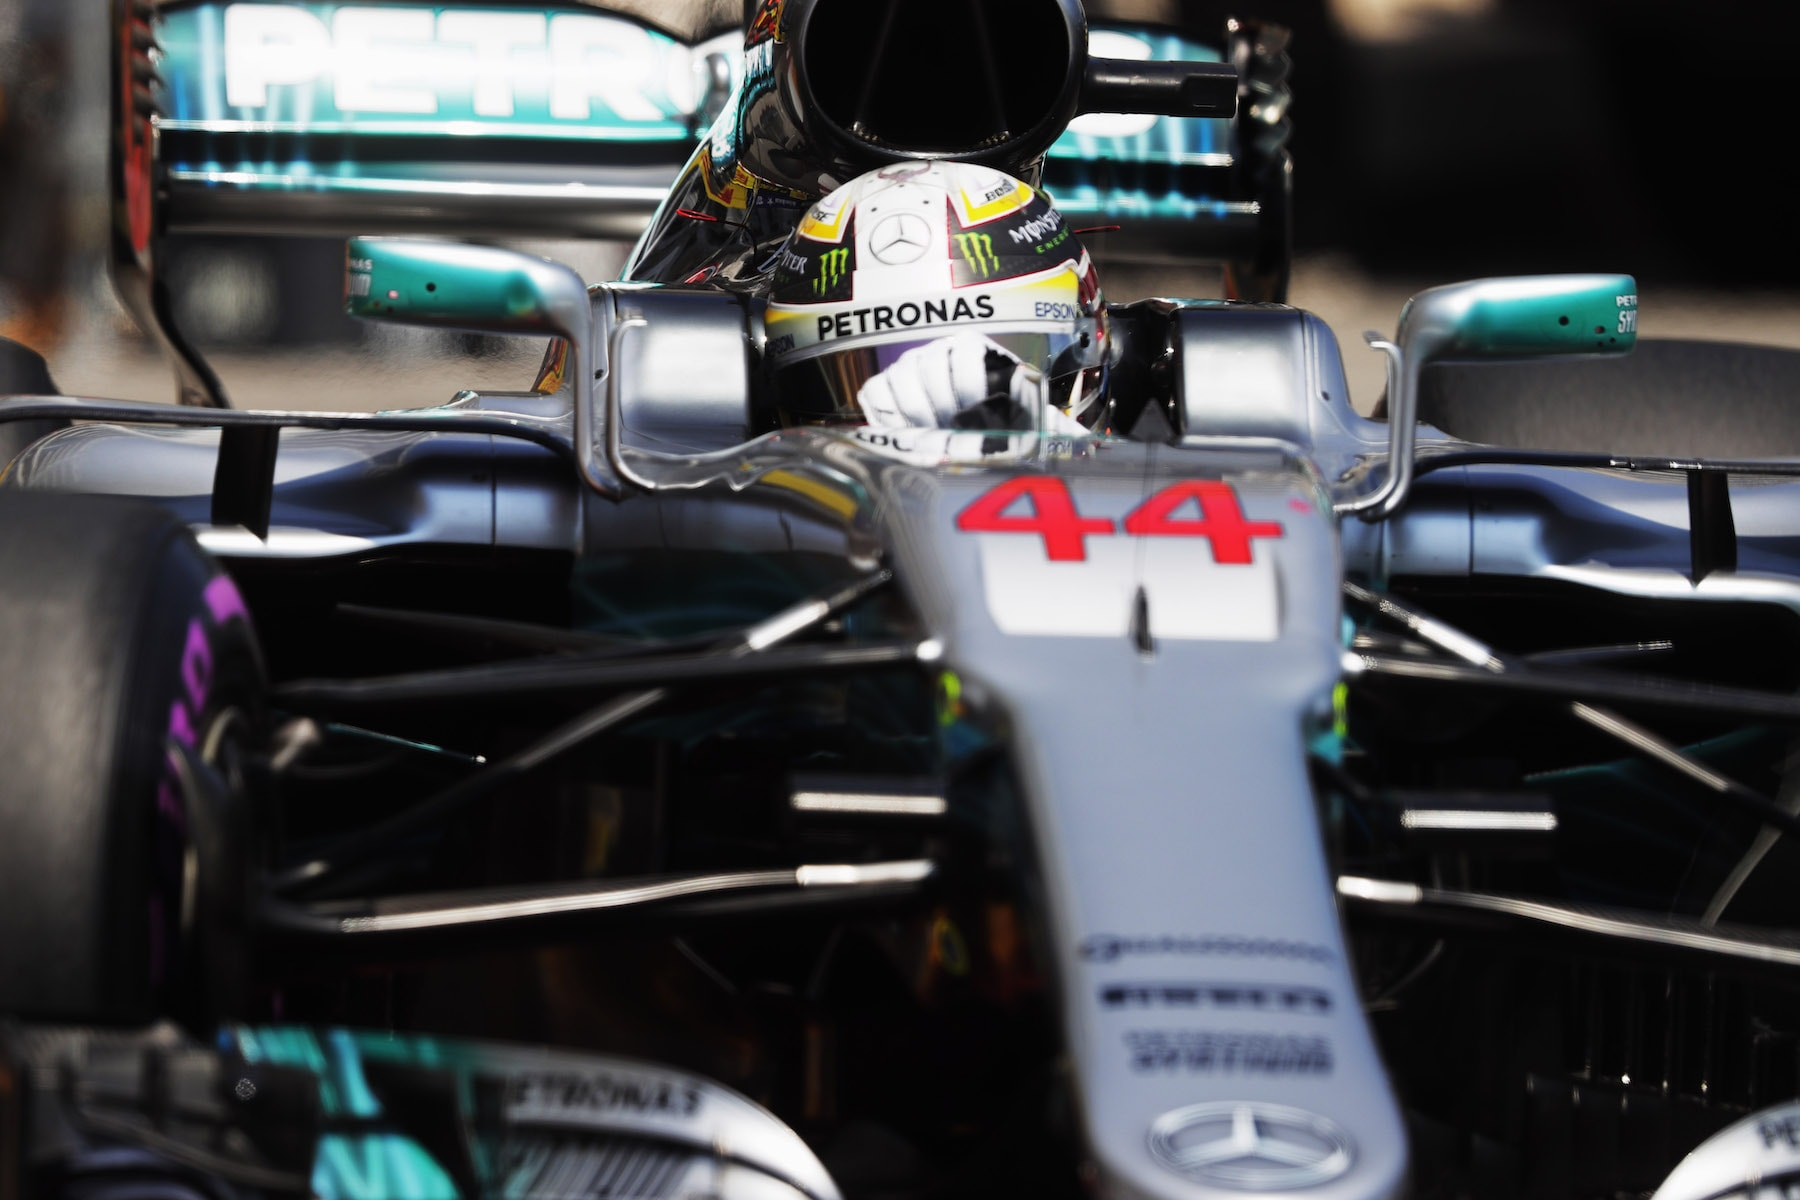 2017 Lewis Hamilton | Mercedes W08 | 2017 Monaco GP Q2 1 copy.jpg